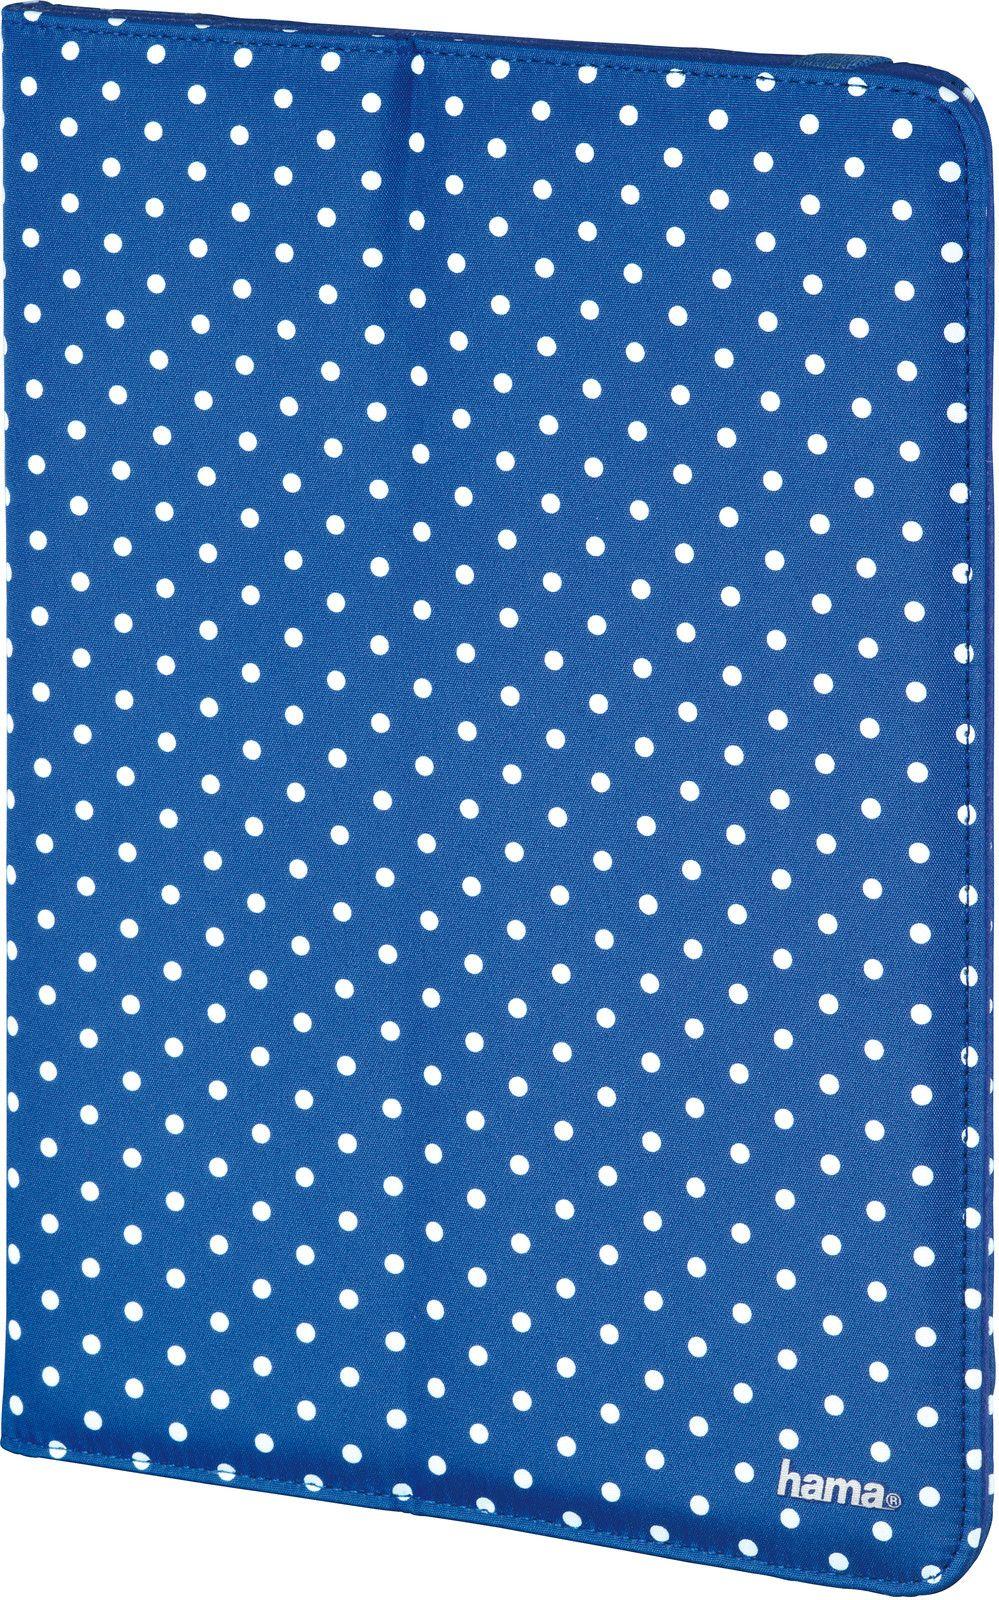 Hama Polka Dots Cover (iPad mini) - Blå